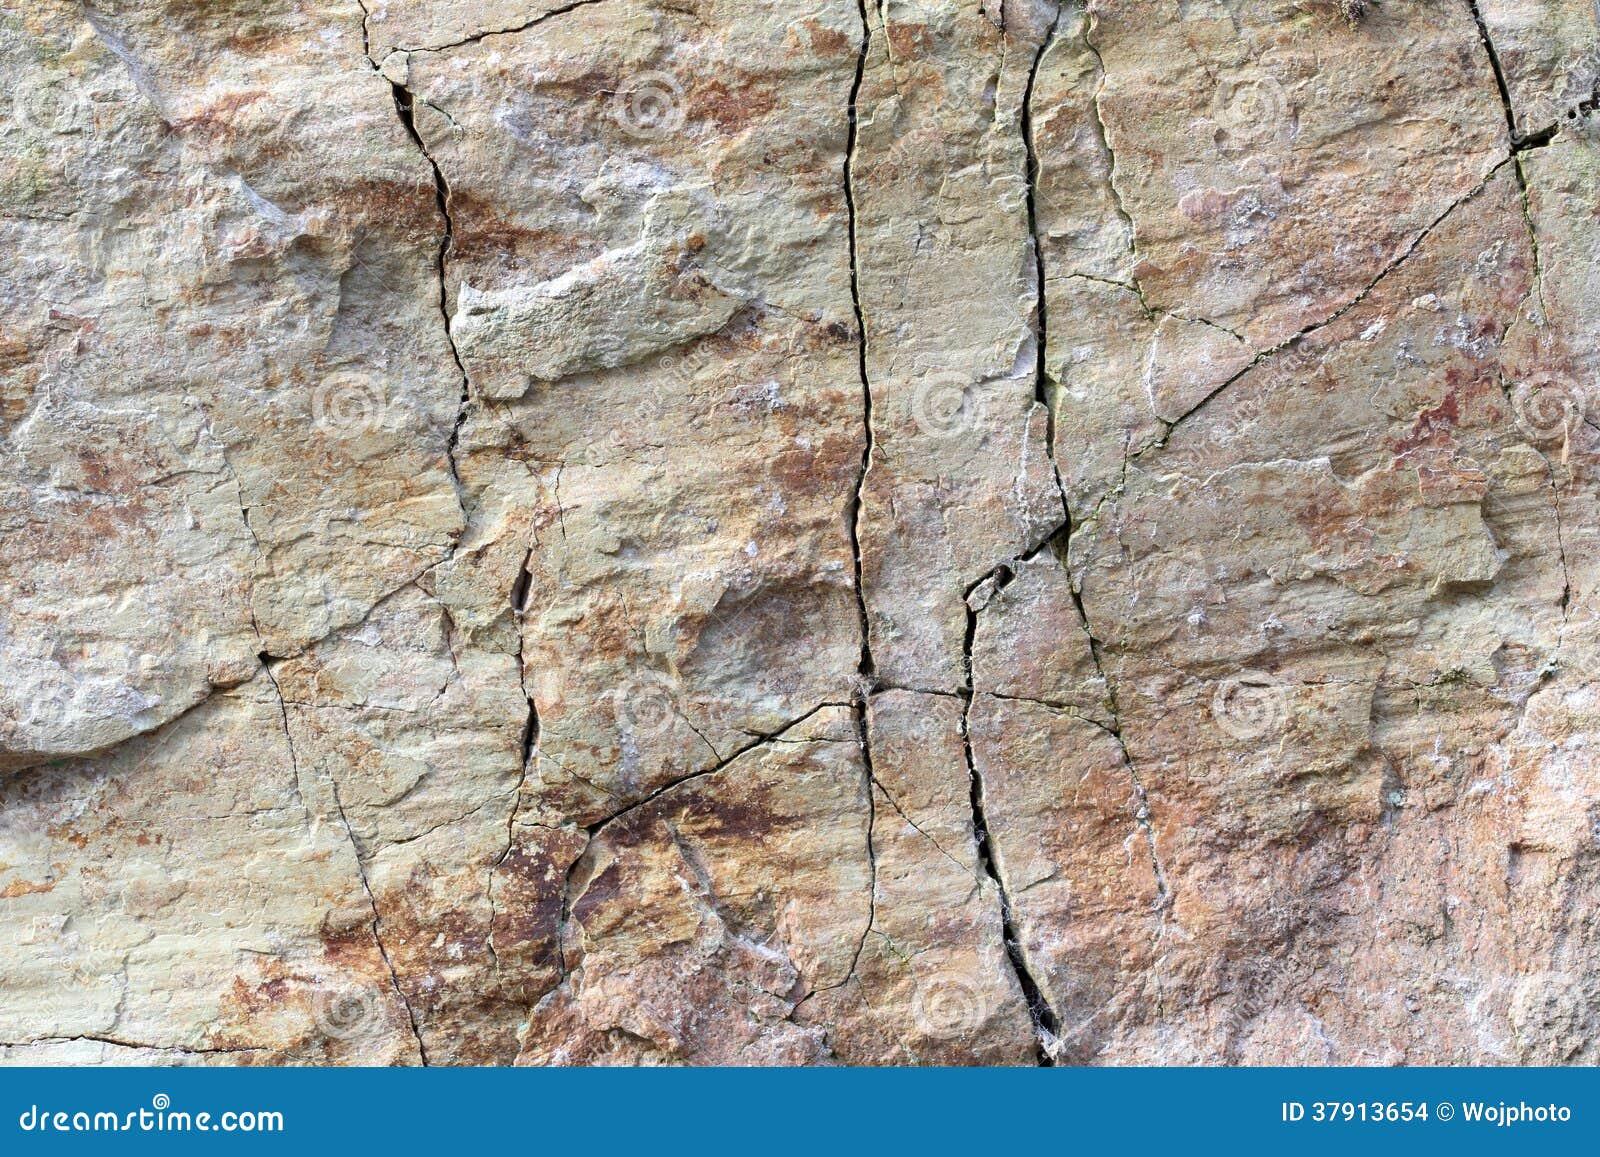 Weathered Granite Stone : Cracked granite stone texture stock images image